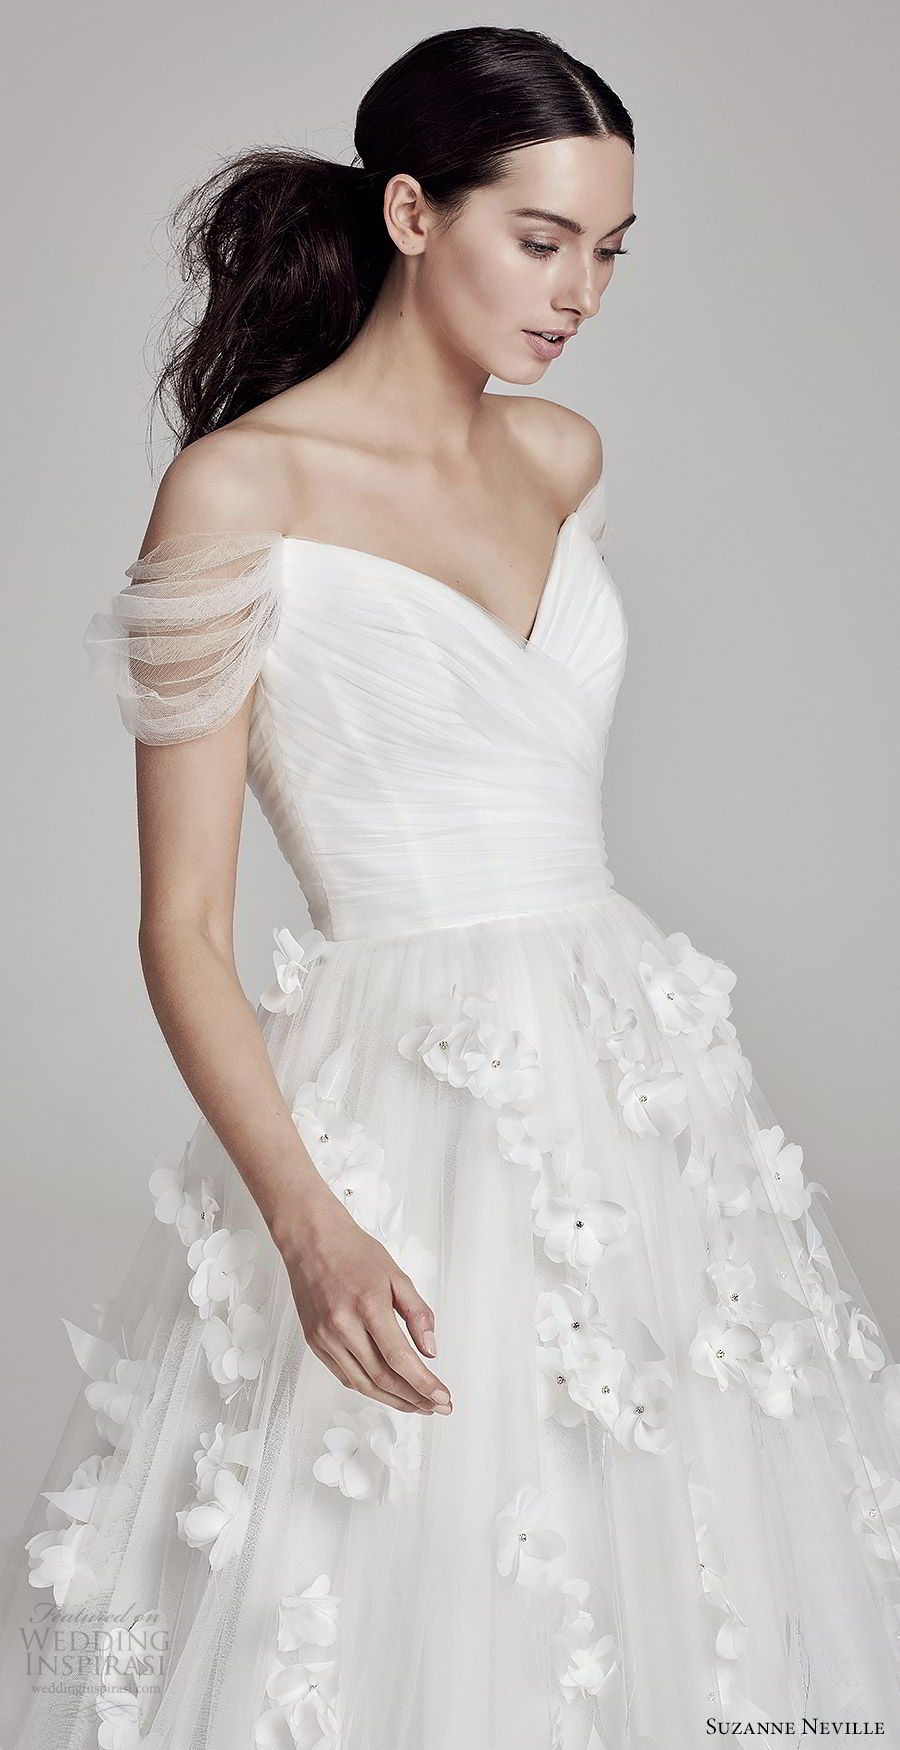 suzanne neville bridal 2019 off shoulder sweetheart neckline ruched bodice ball gown wedding dress (juliette) romantic prinecess mv